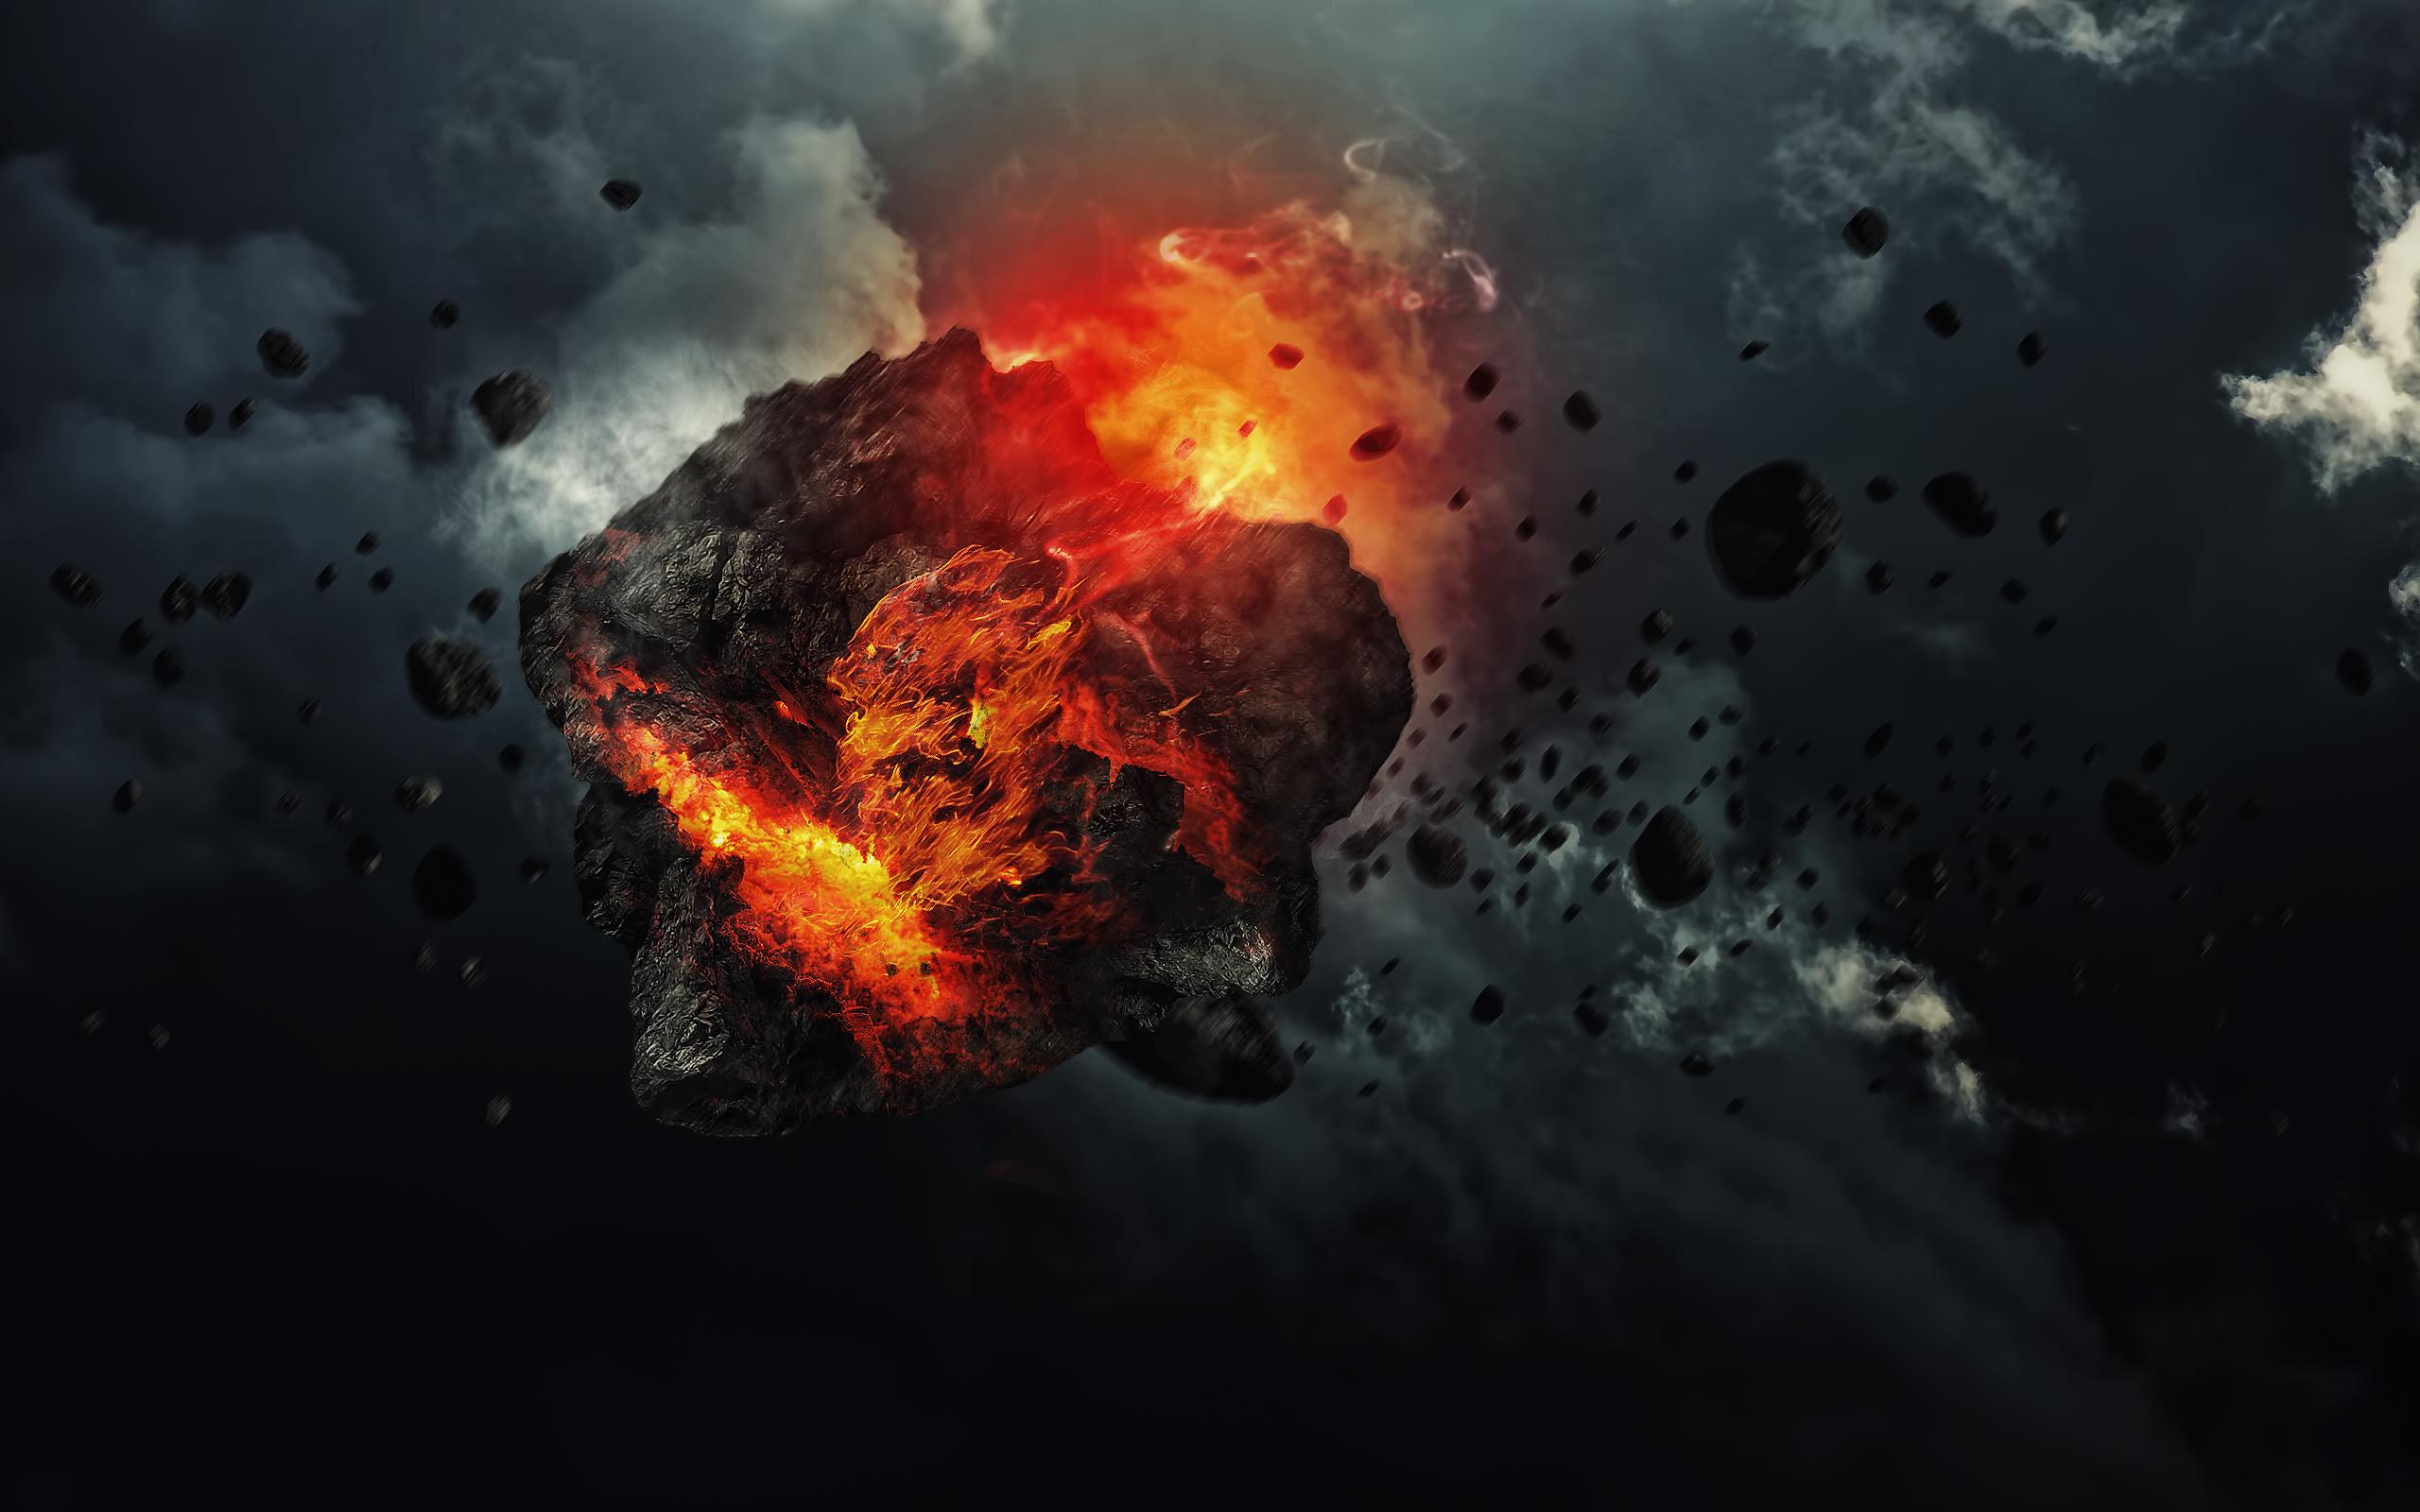 Asteroid4115919667 - Asteroid - Hubble, Asteroid